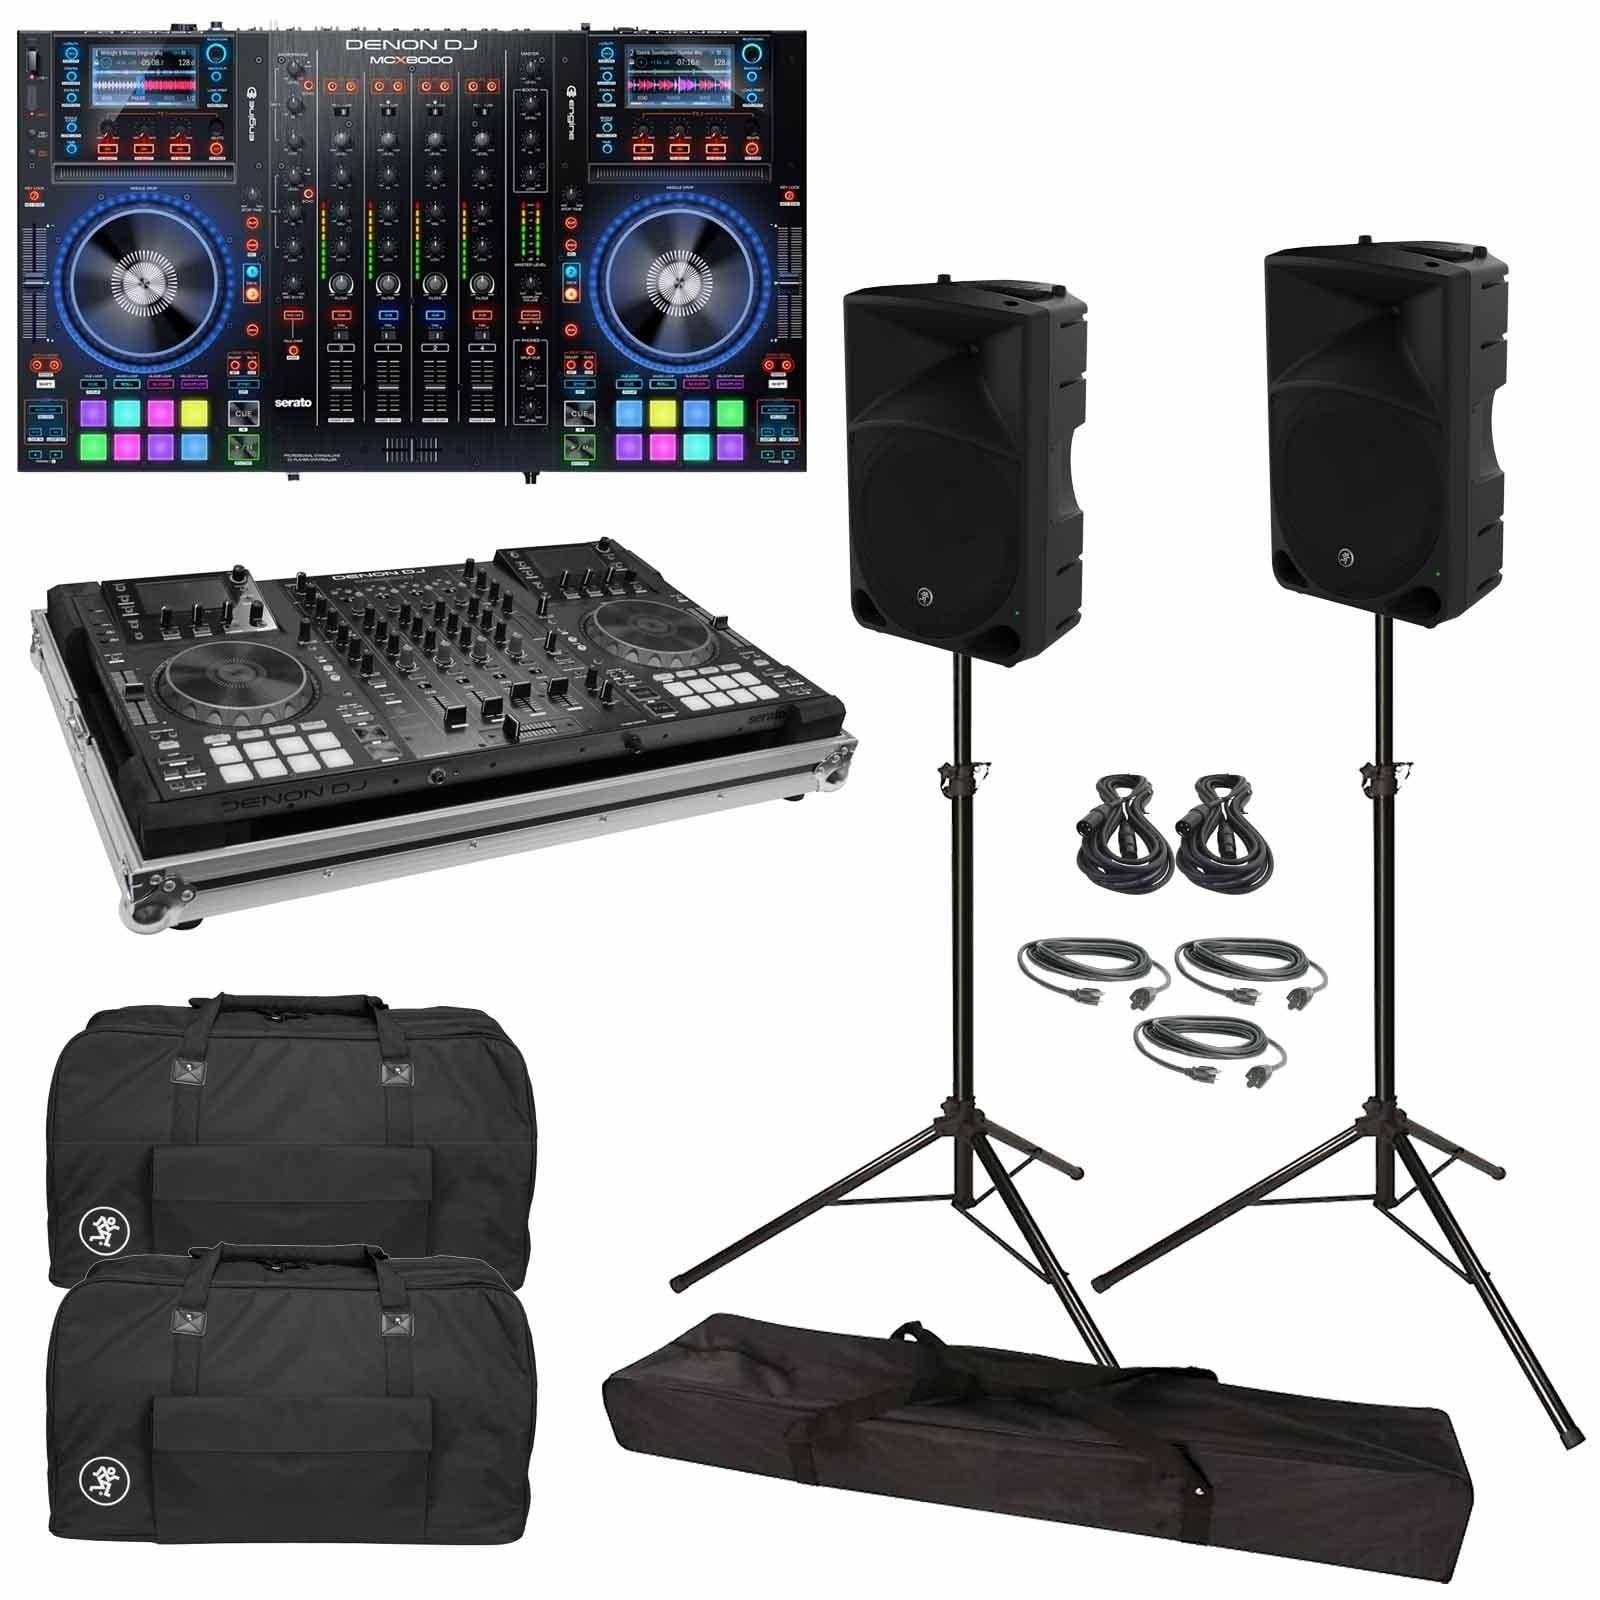 denon-dj-mcx8000-standalone-dj-player-and-dj-controller-mackie-thump15-speakers-dj-package-92c.jpg